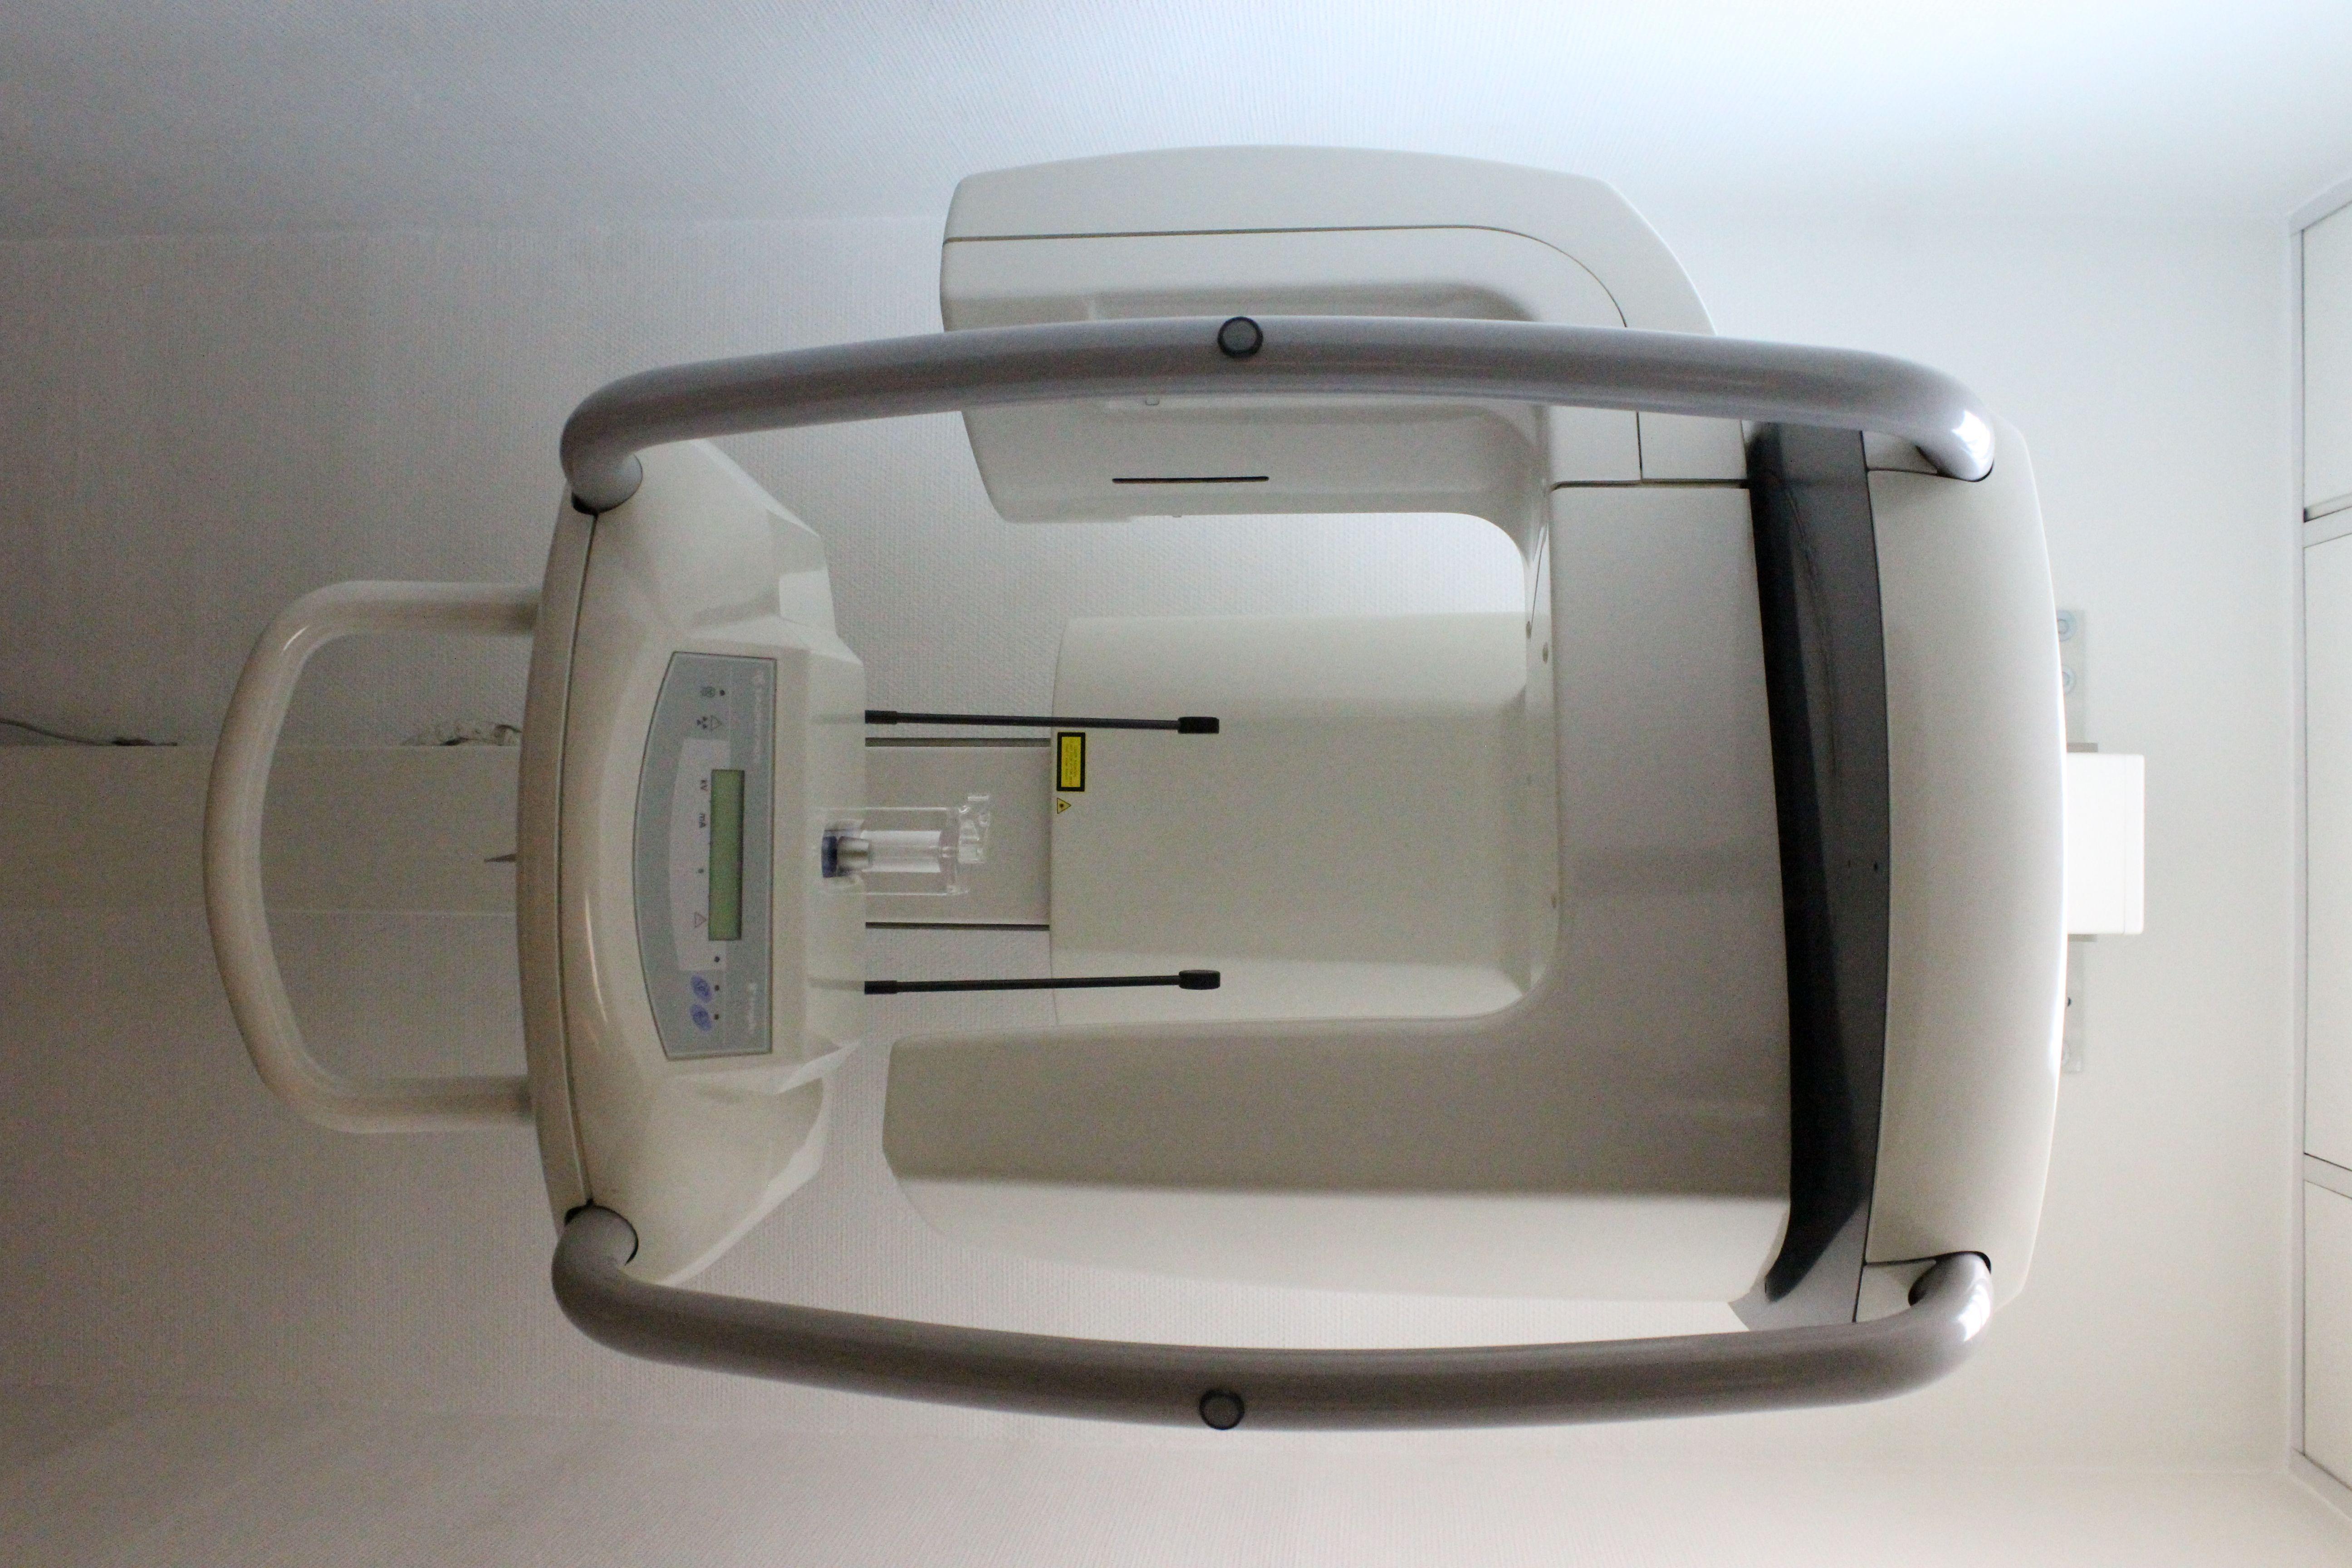 Foto 1 de Dentistas en Madrid | Clínica Dental Dr. Bassanini